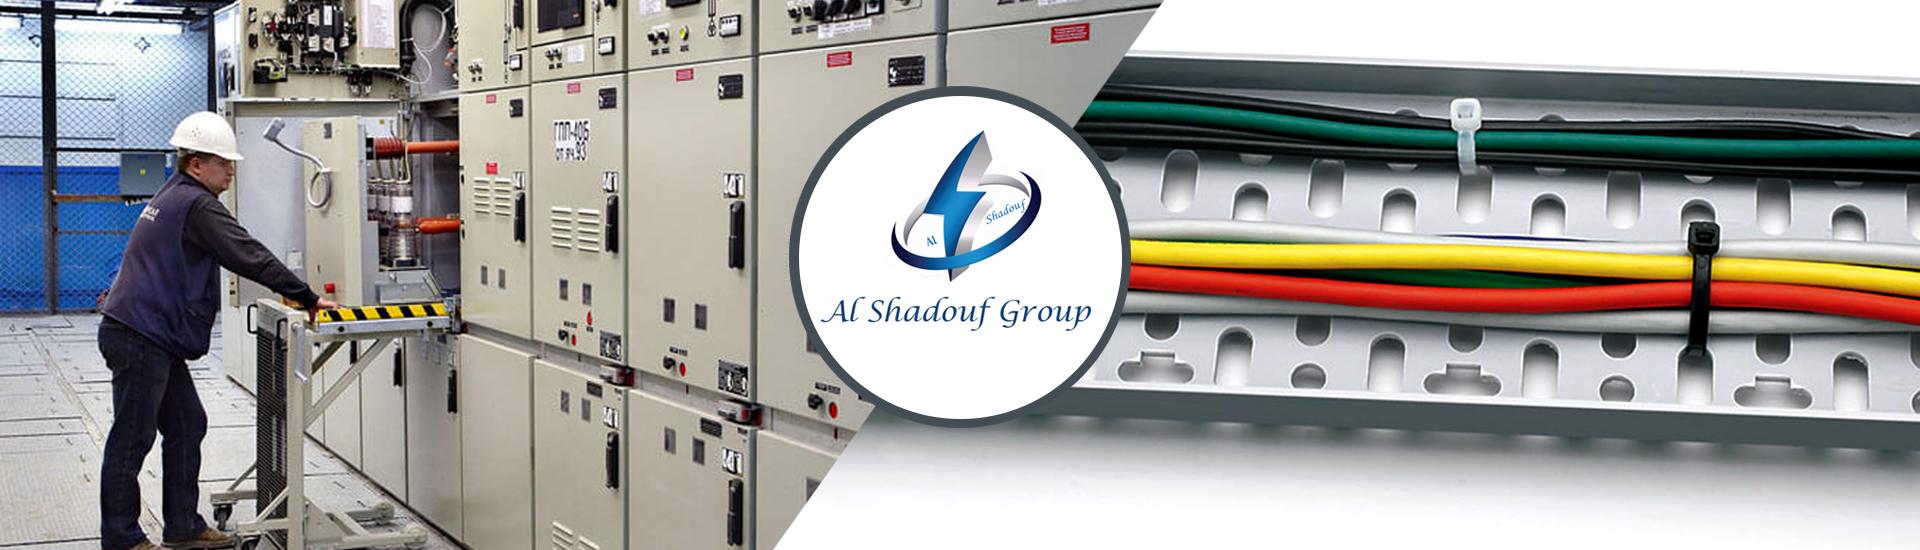 AL SHADOUF ELECTRICAL WARE CO LLC